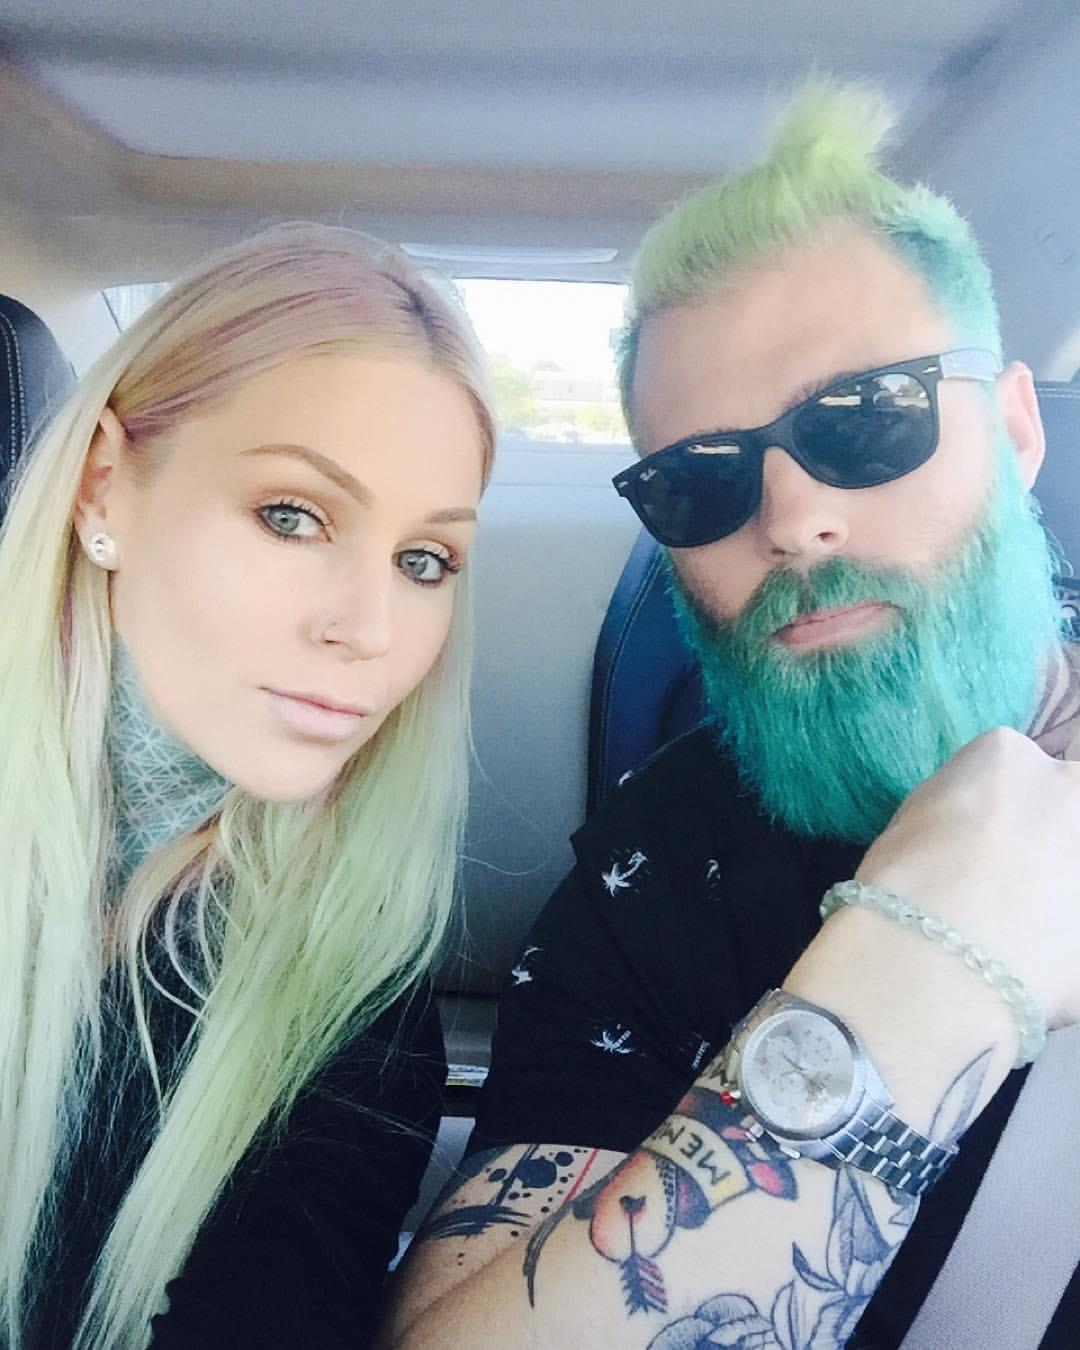 Leanne & Husband, twinning.